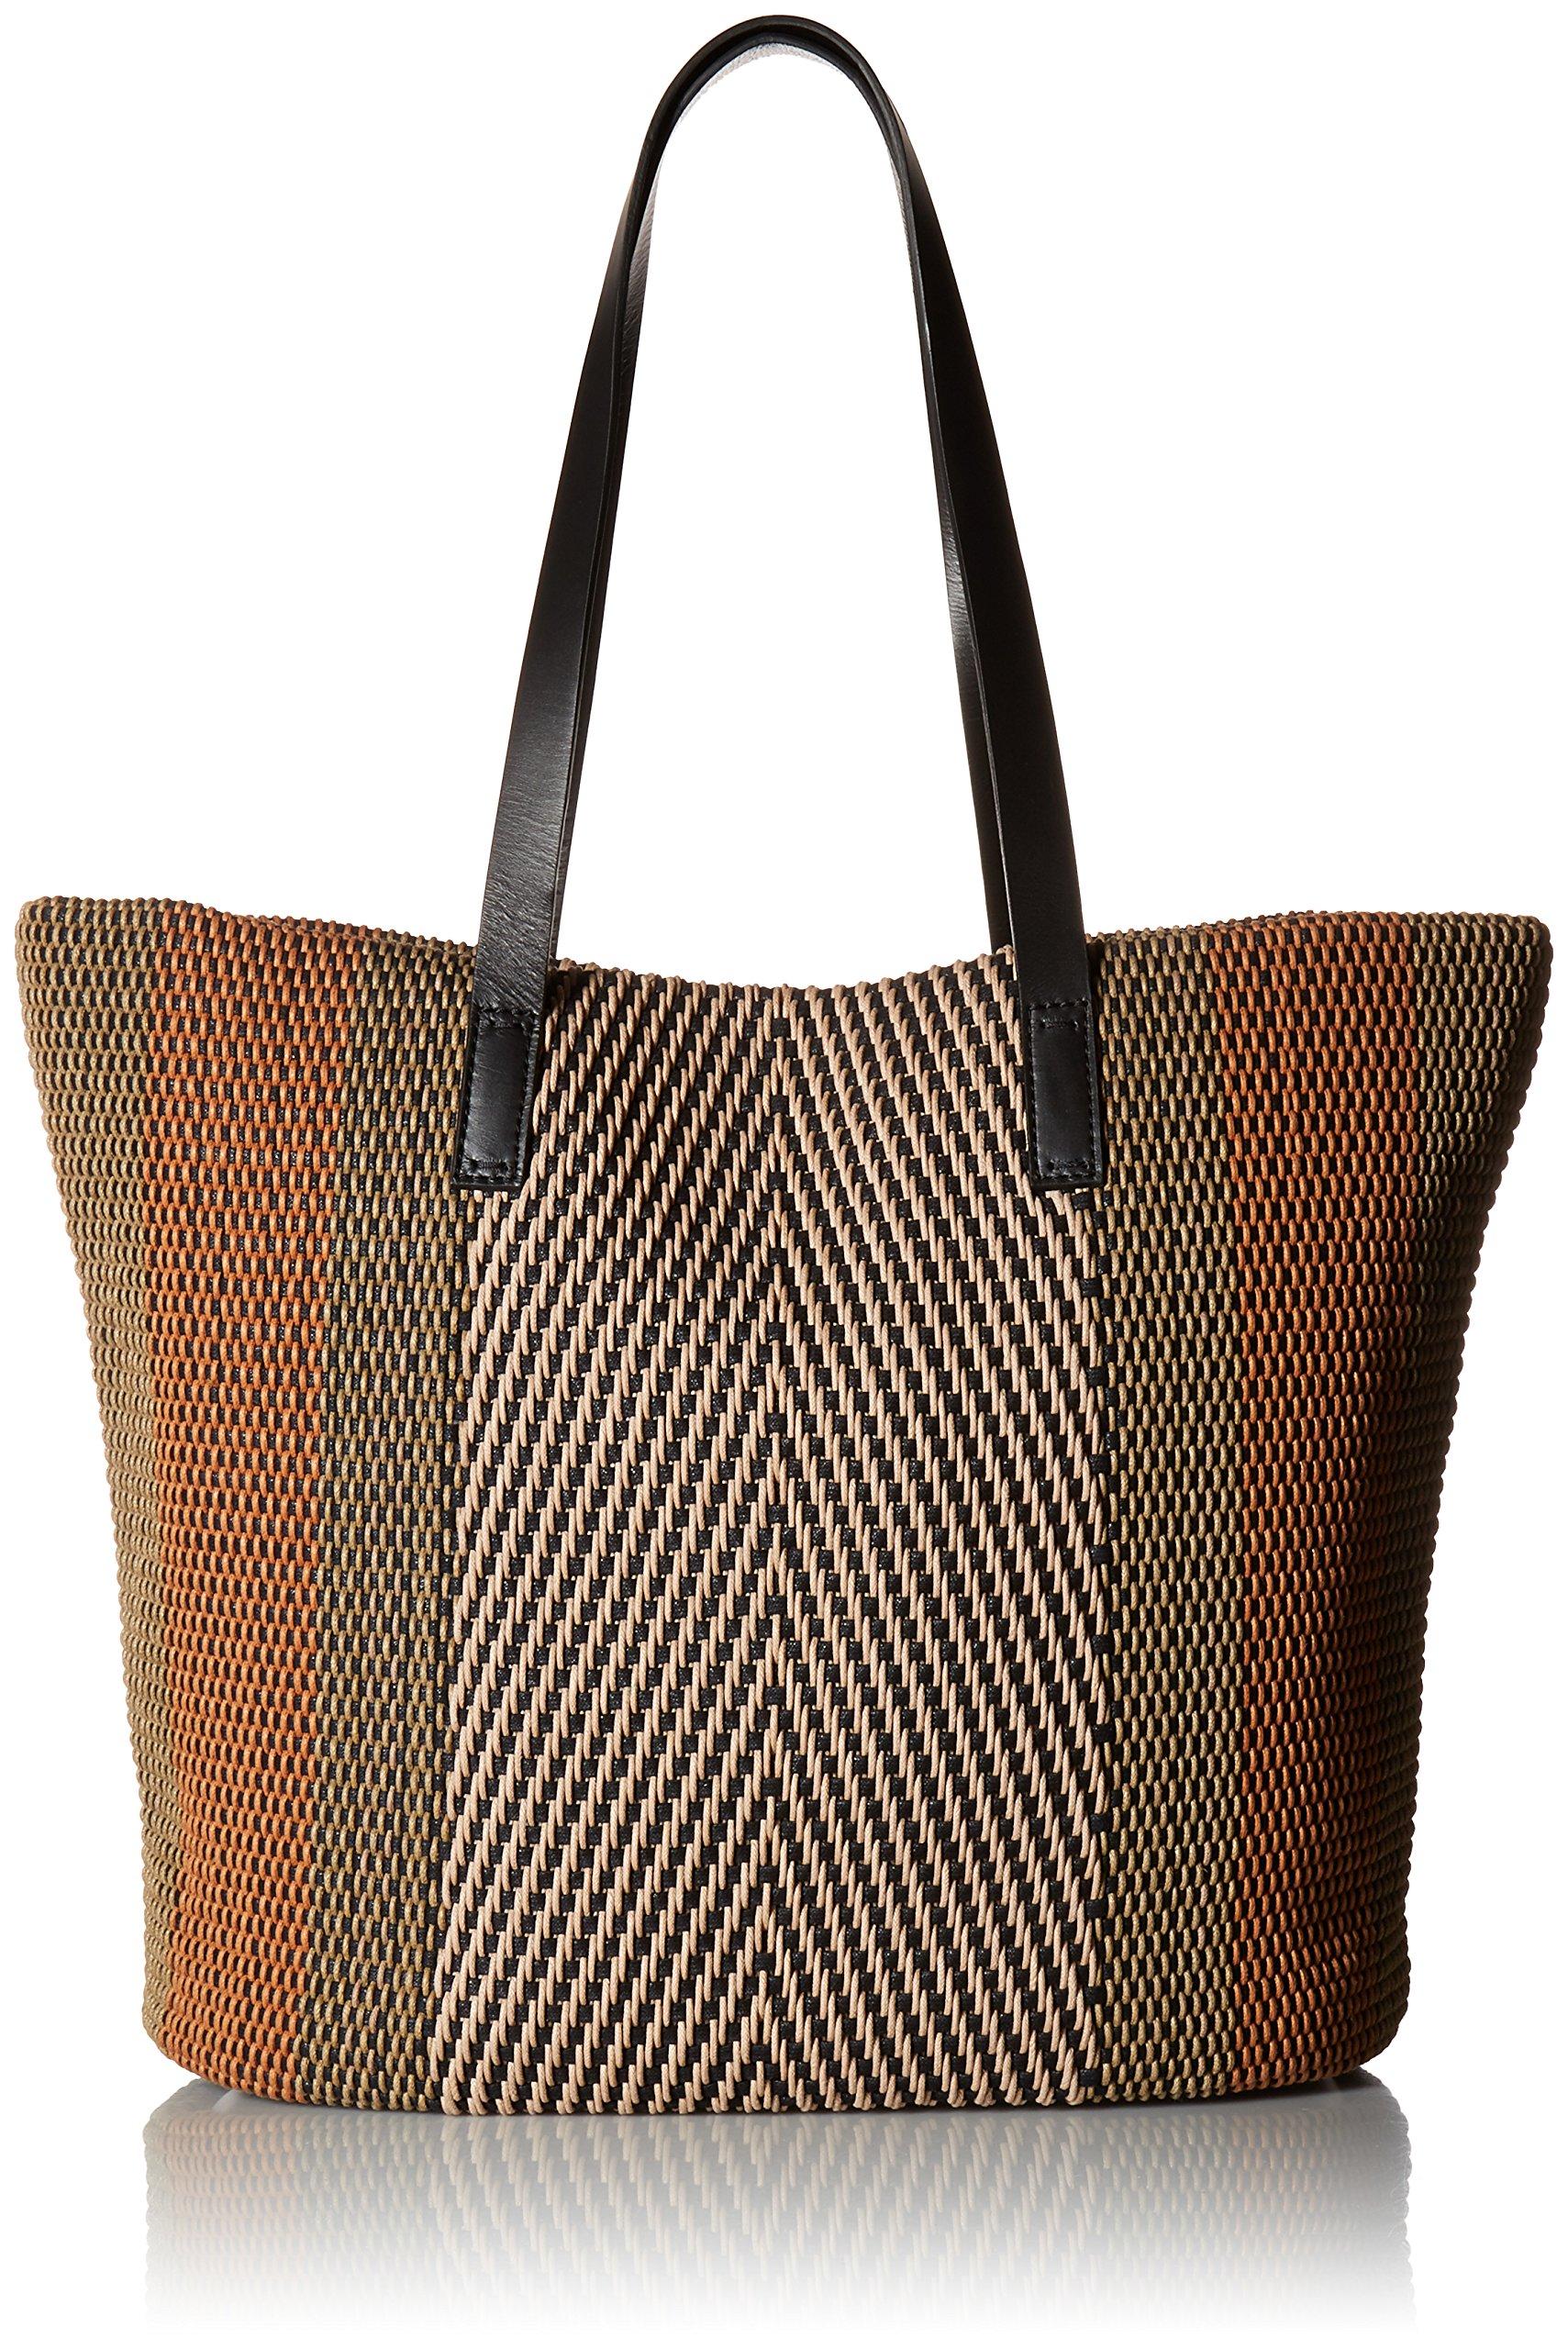 Lucky Teki Tote Bag, Natural/blac